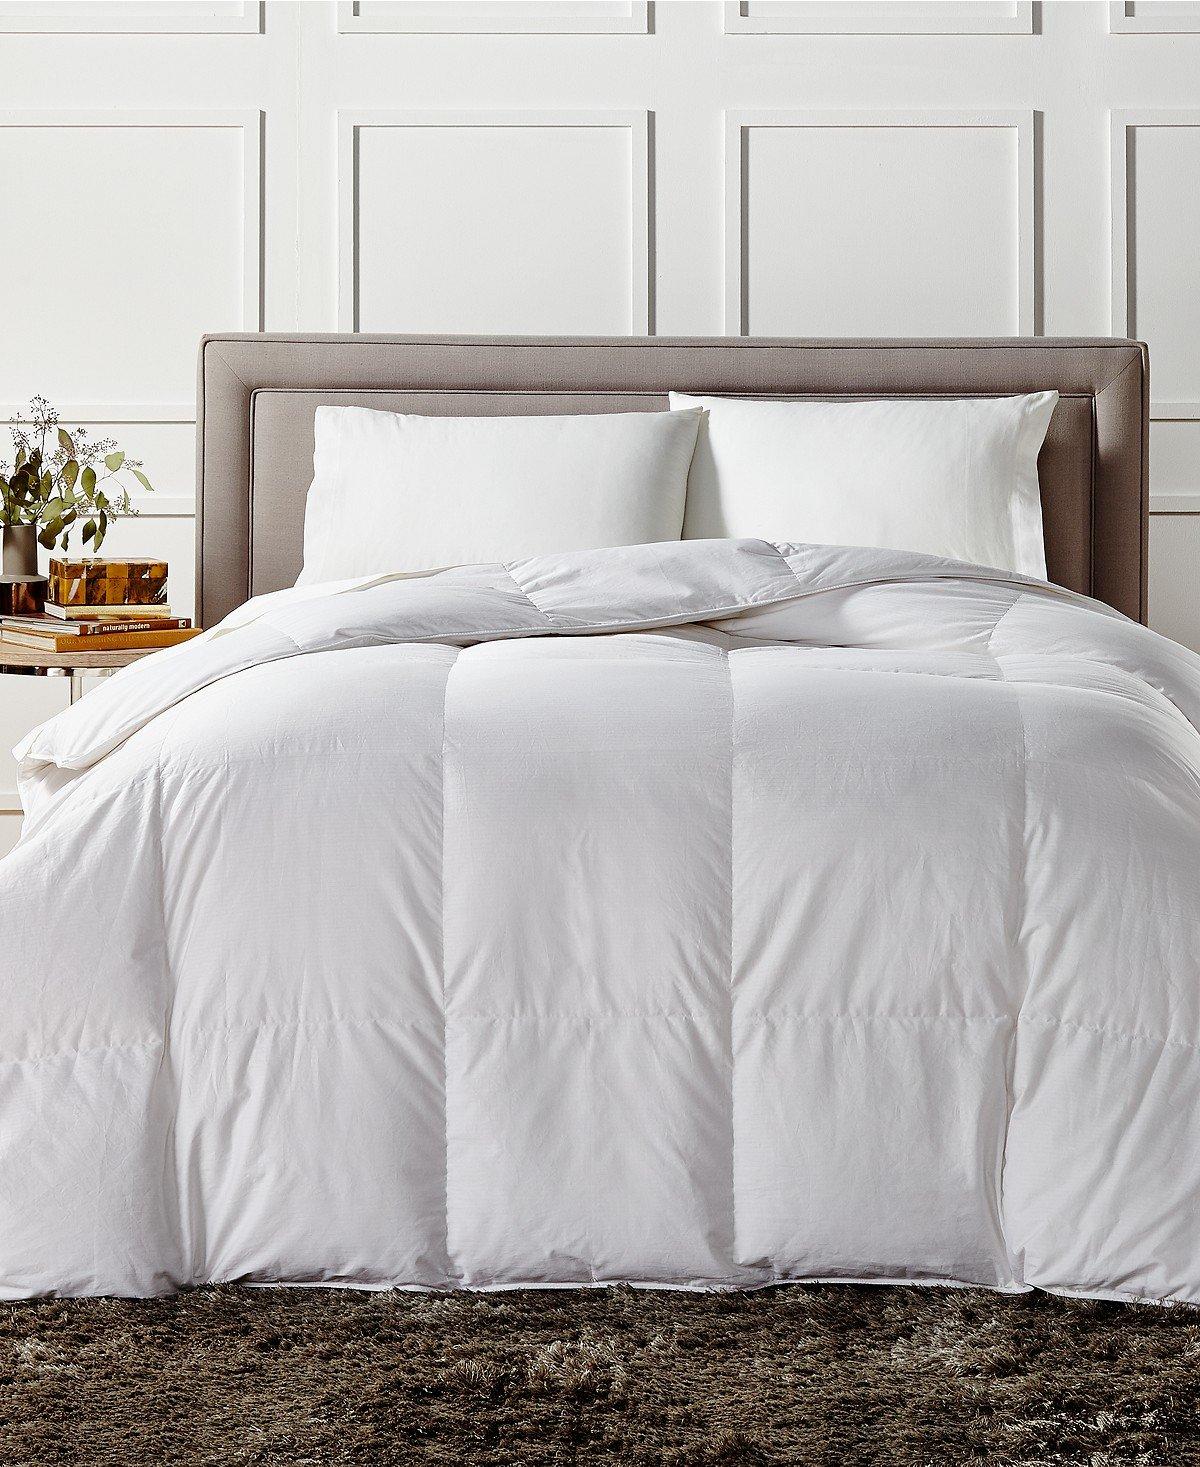 Charter Club European White Down Medium Weight Full Queen Comforter - Hypoallergenic, UltraClean